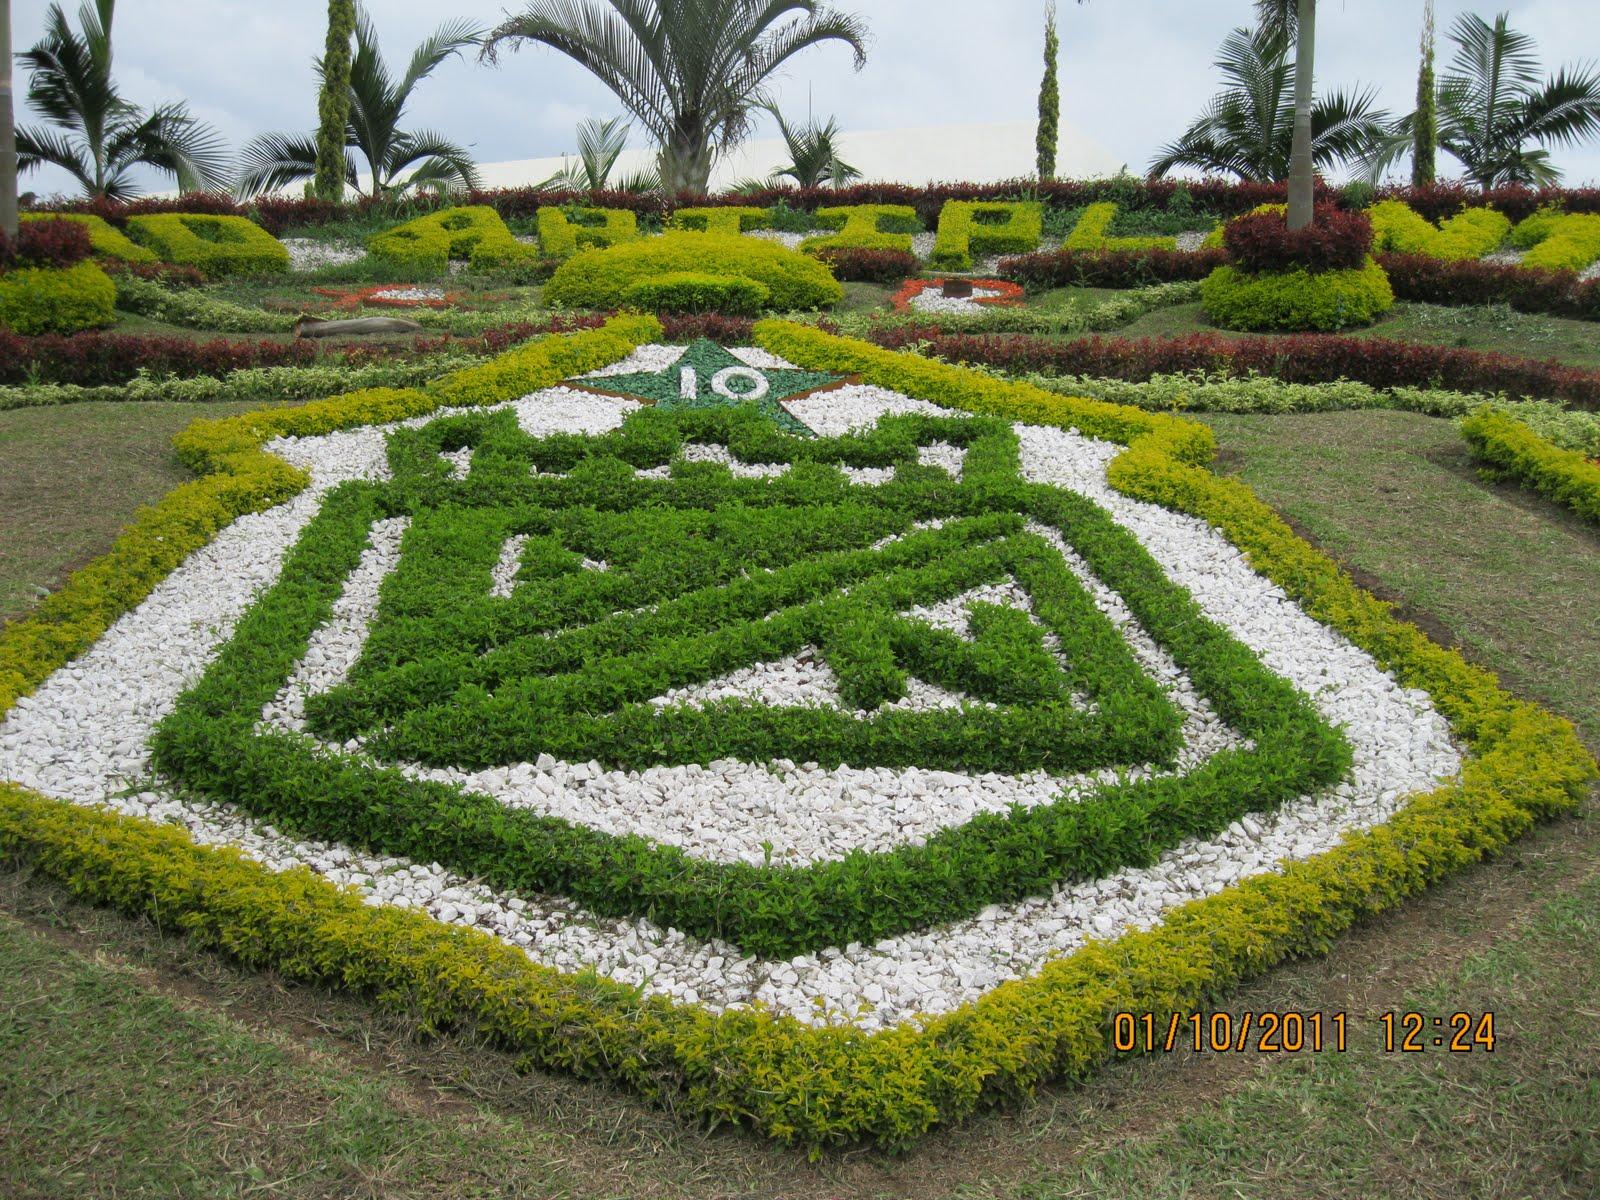 Vivero a j decoracion de jardines for Viveros de jardin